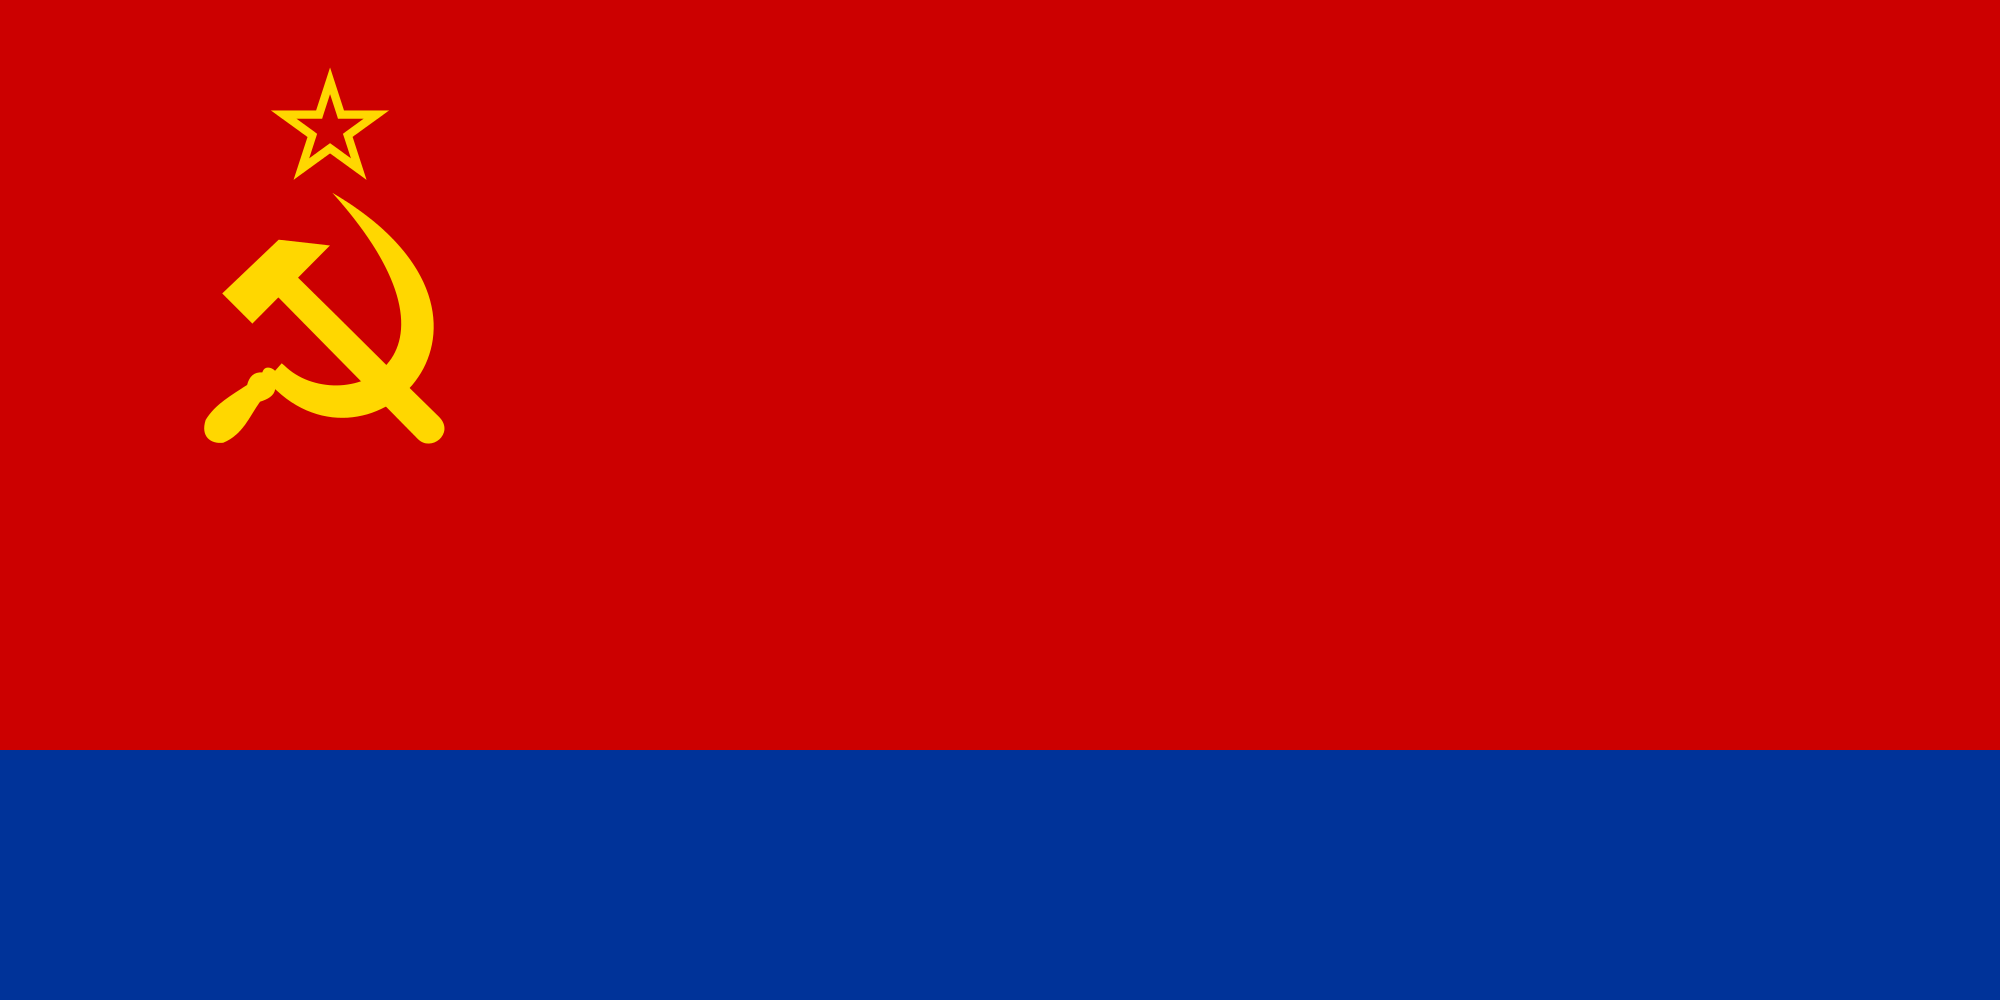 Soviet Union CCCP images Azerbaijan SSR Flag HD wallpaper and 2000x1000